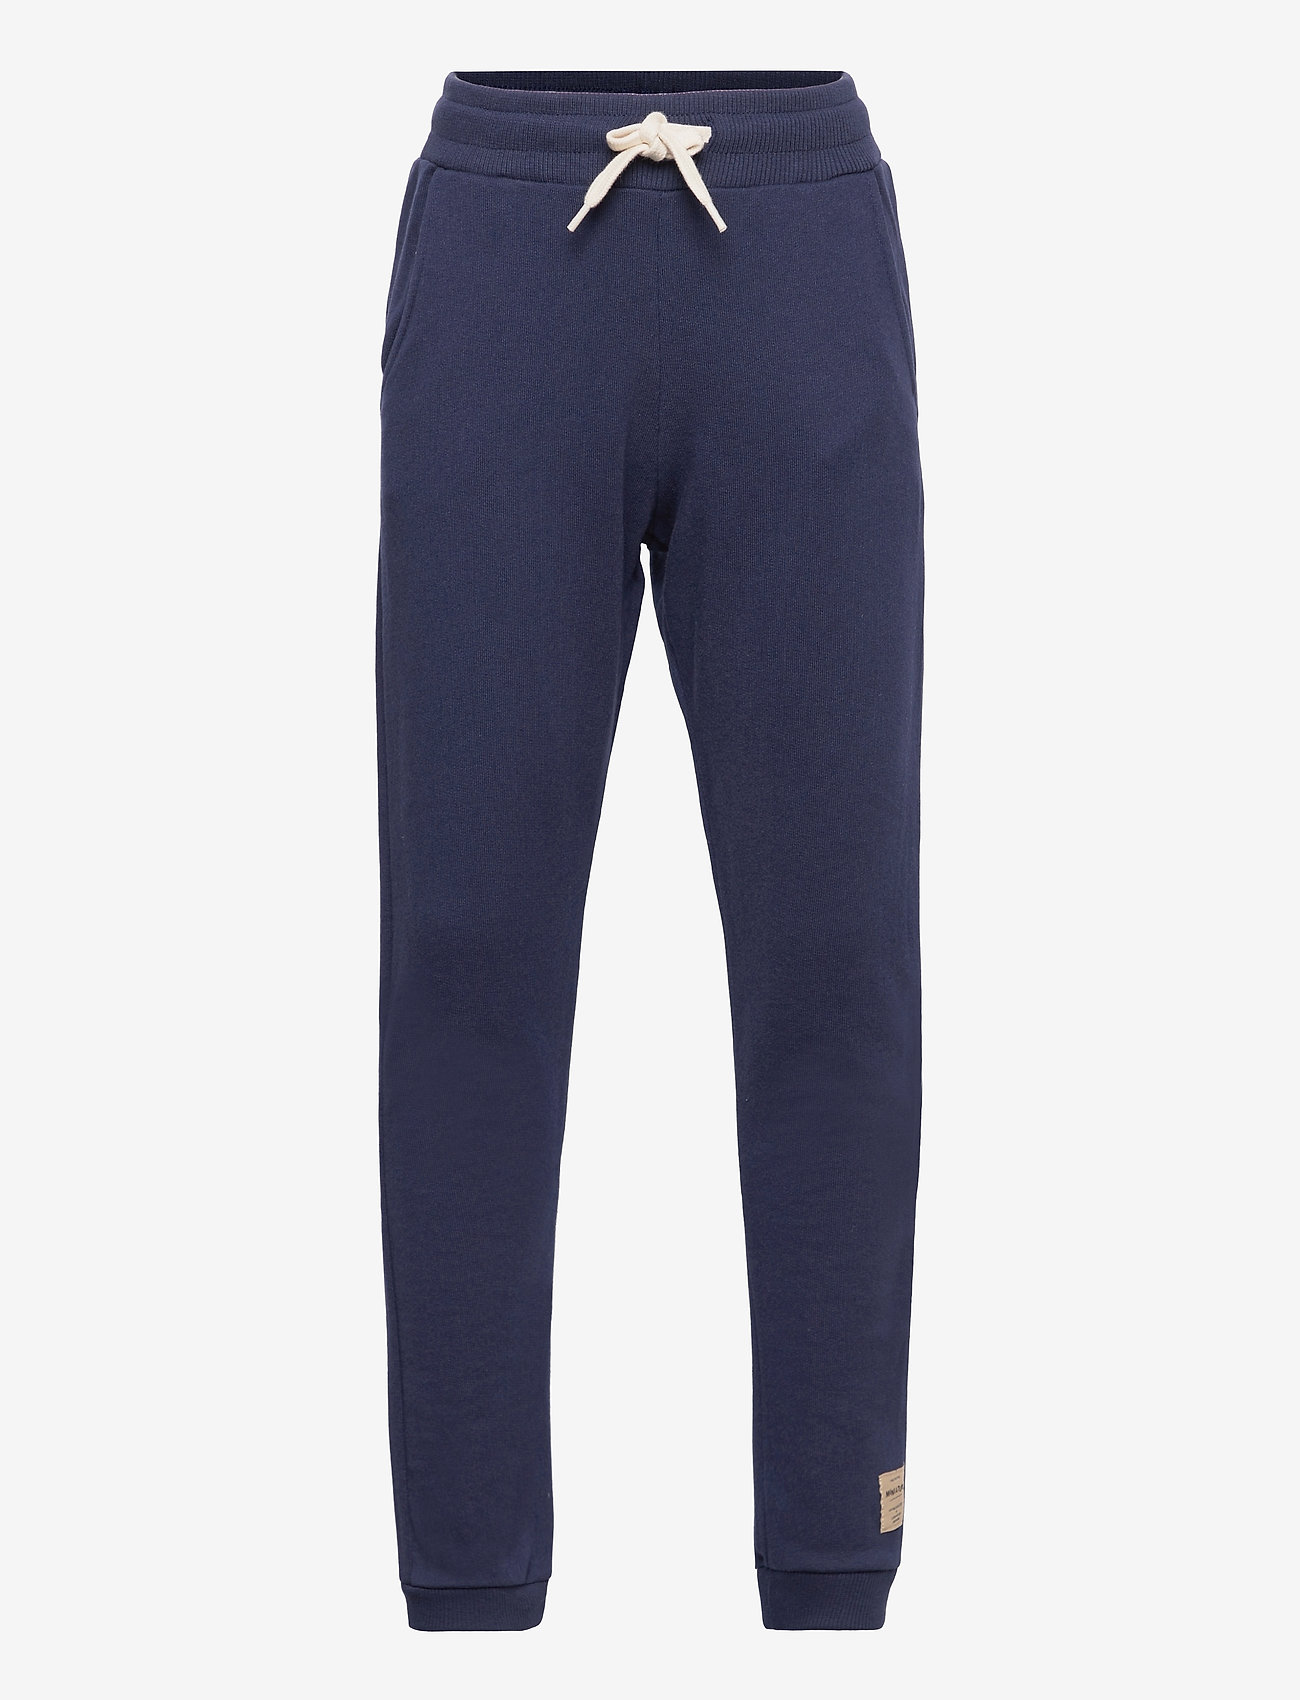 Mini A Ture - Even pants, K - sweatpants - maritime blue - 0